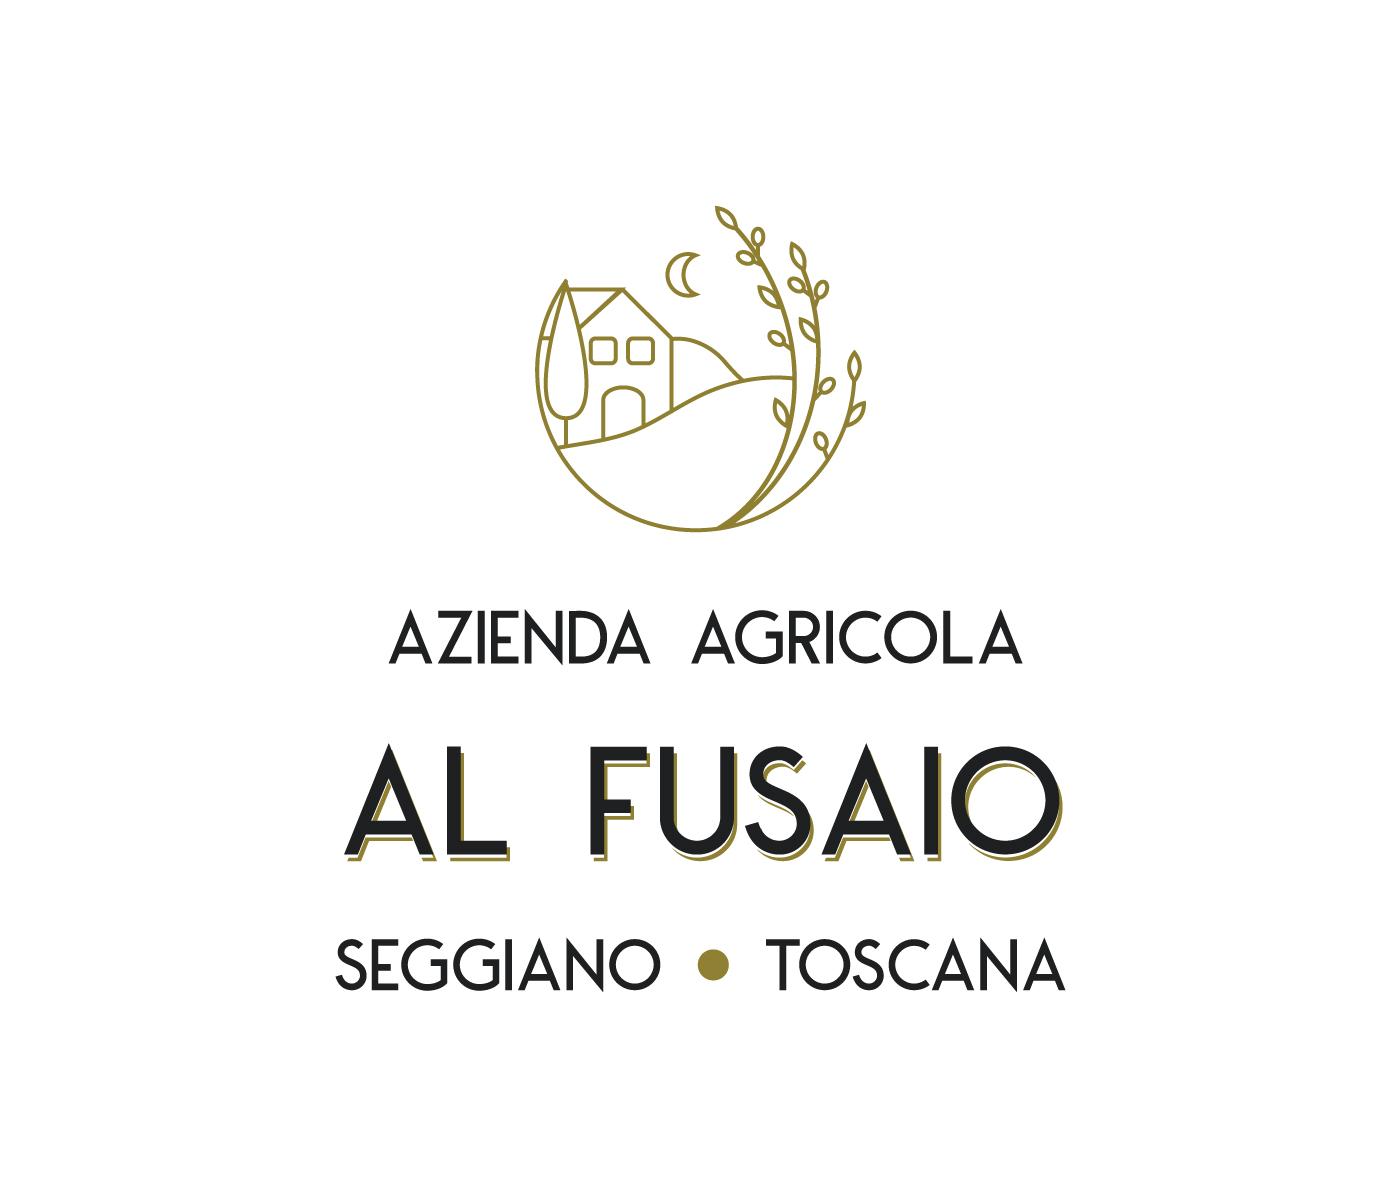 Logo definitivo azienda agricola al fusaio